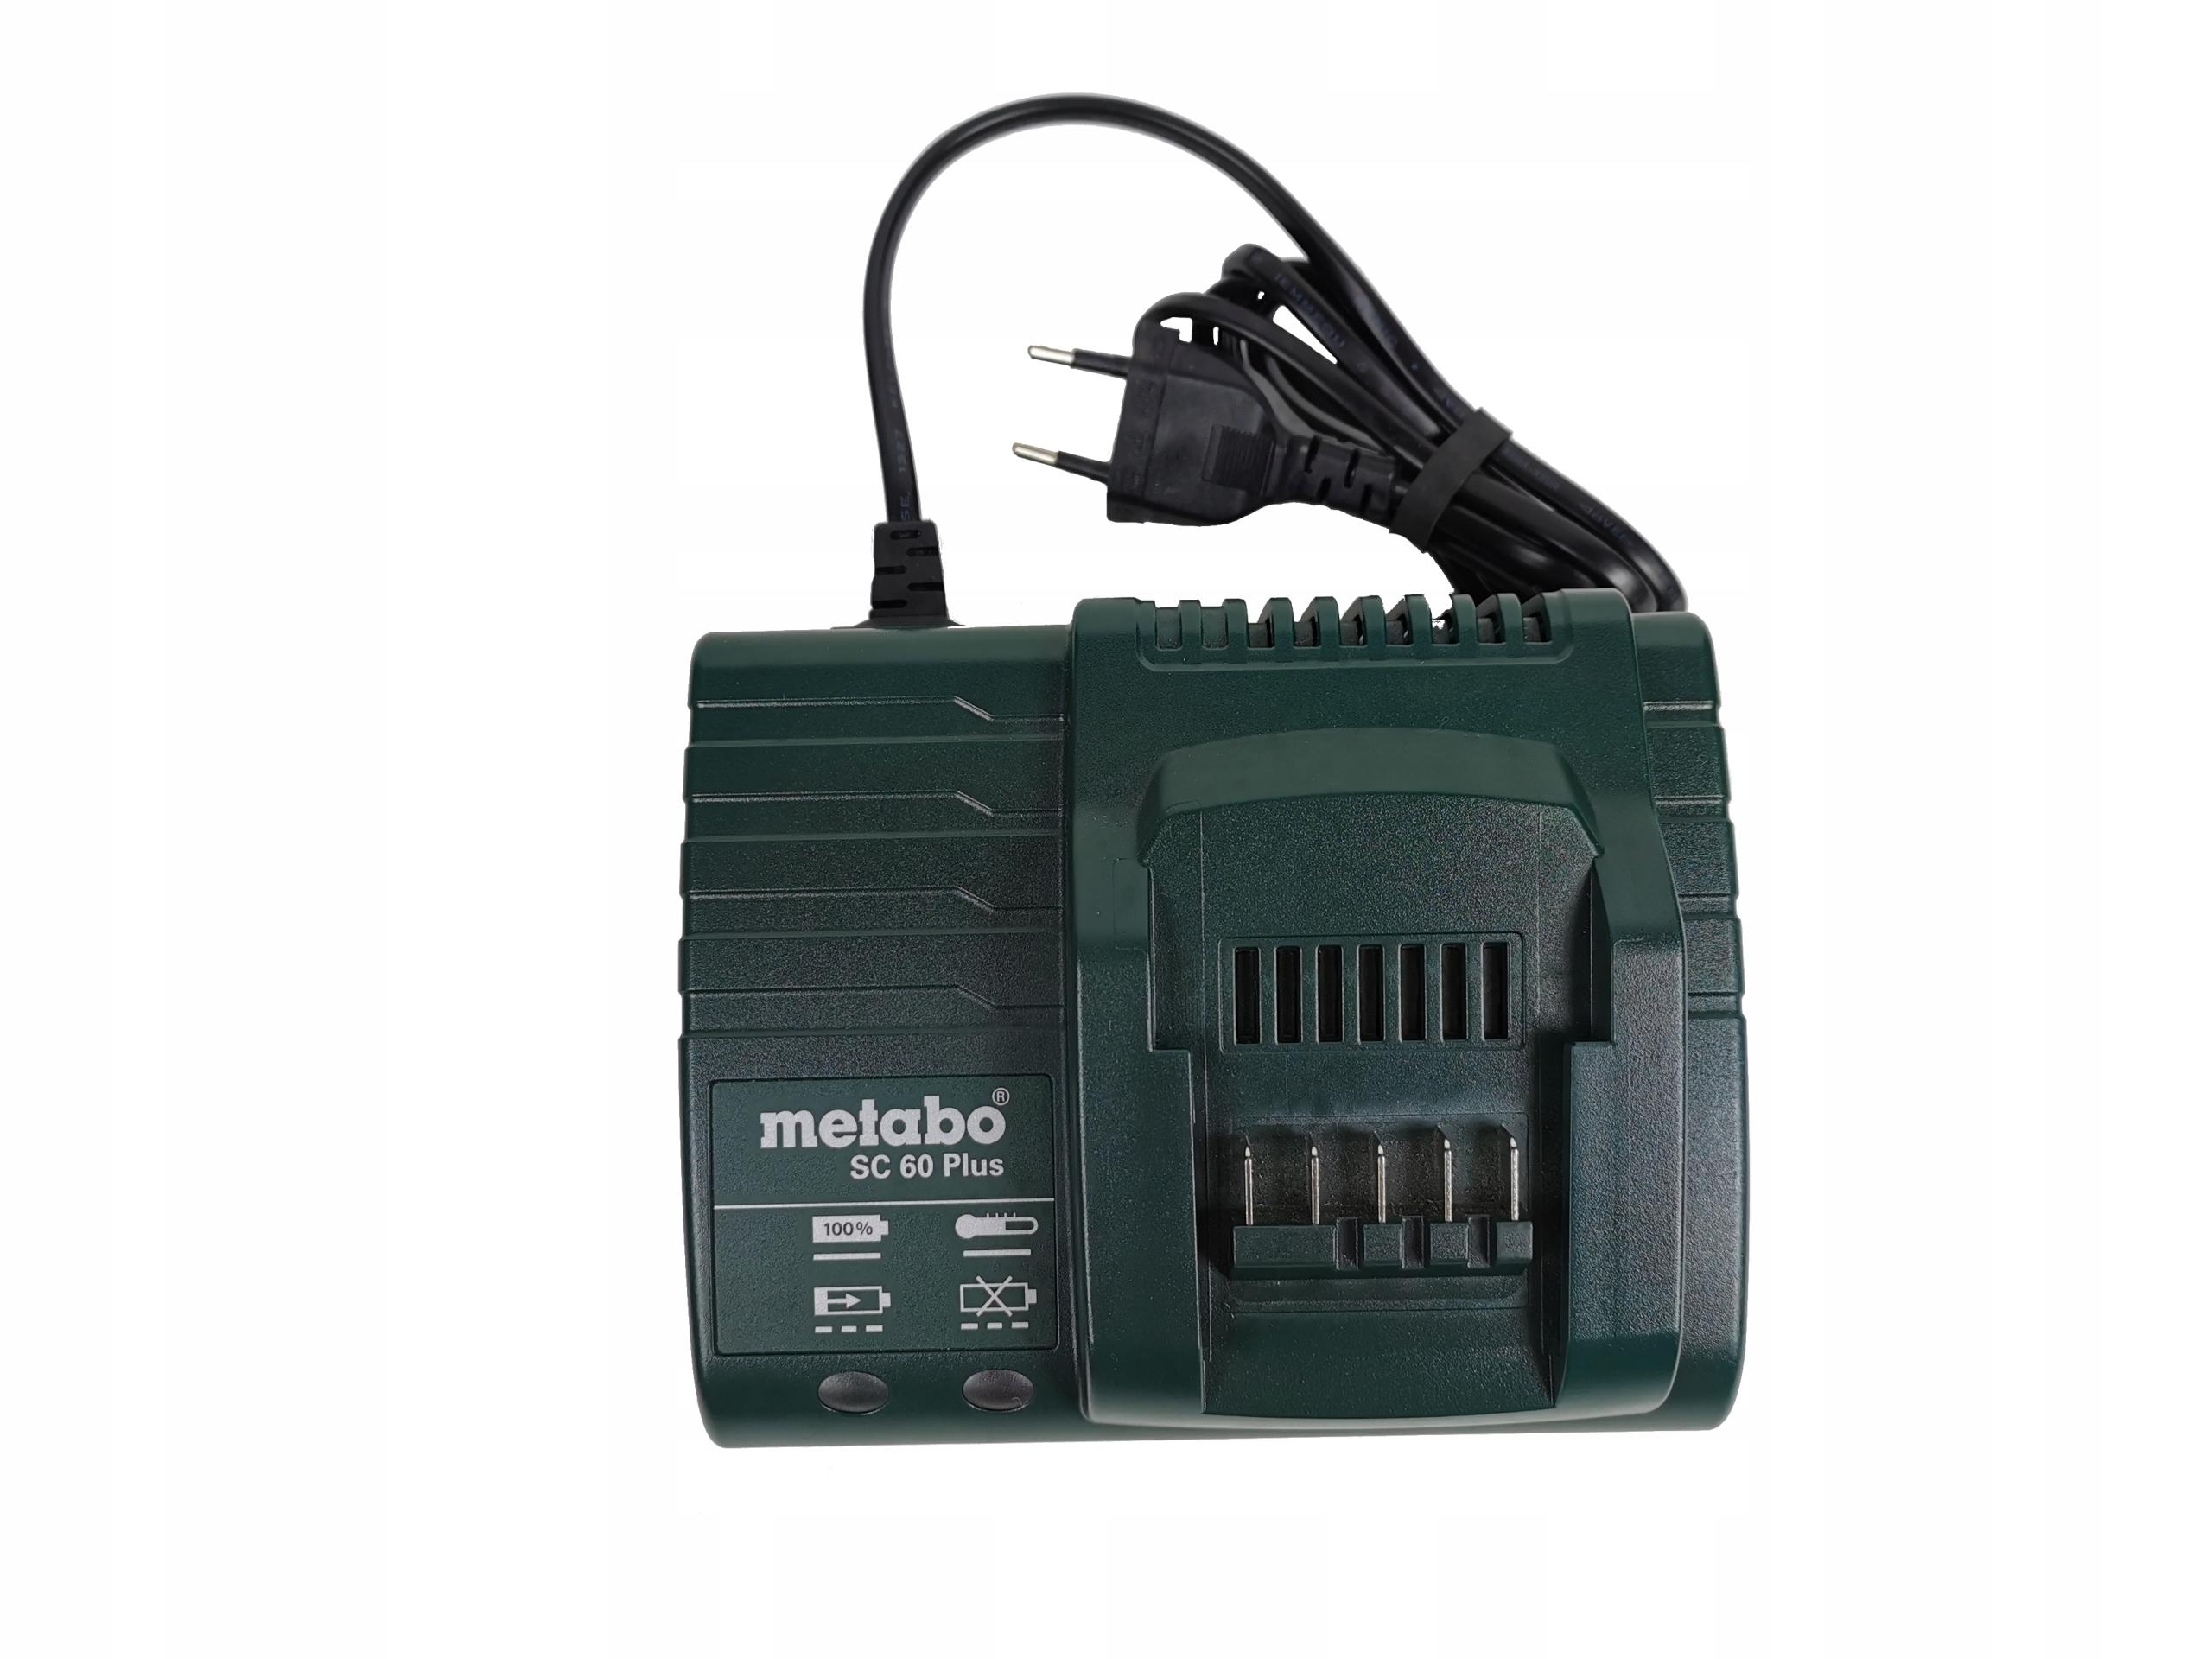 METABO SC 60 Plus ładowarka do aku 10,8 - 18V 1,5A Marka Metabo